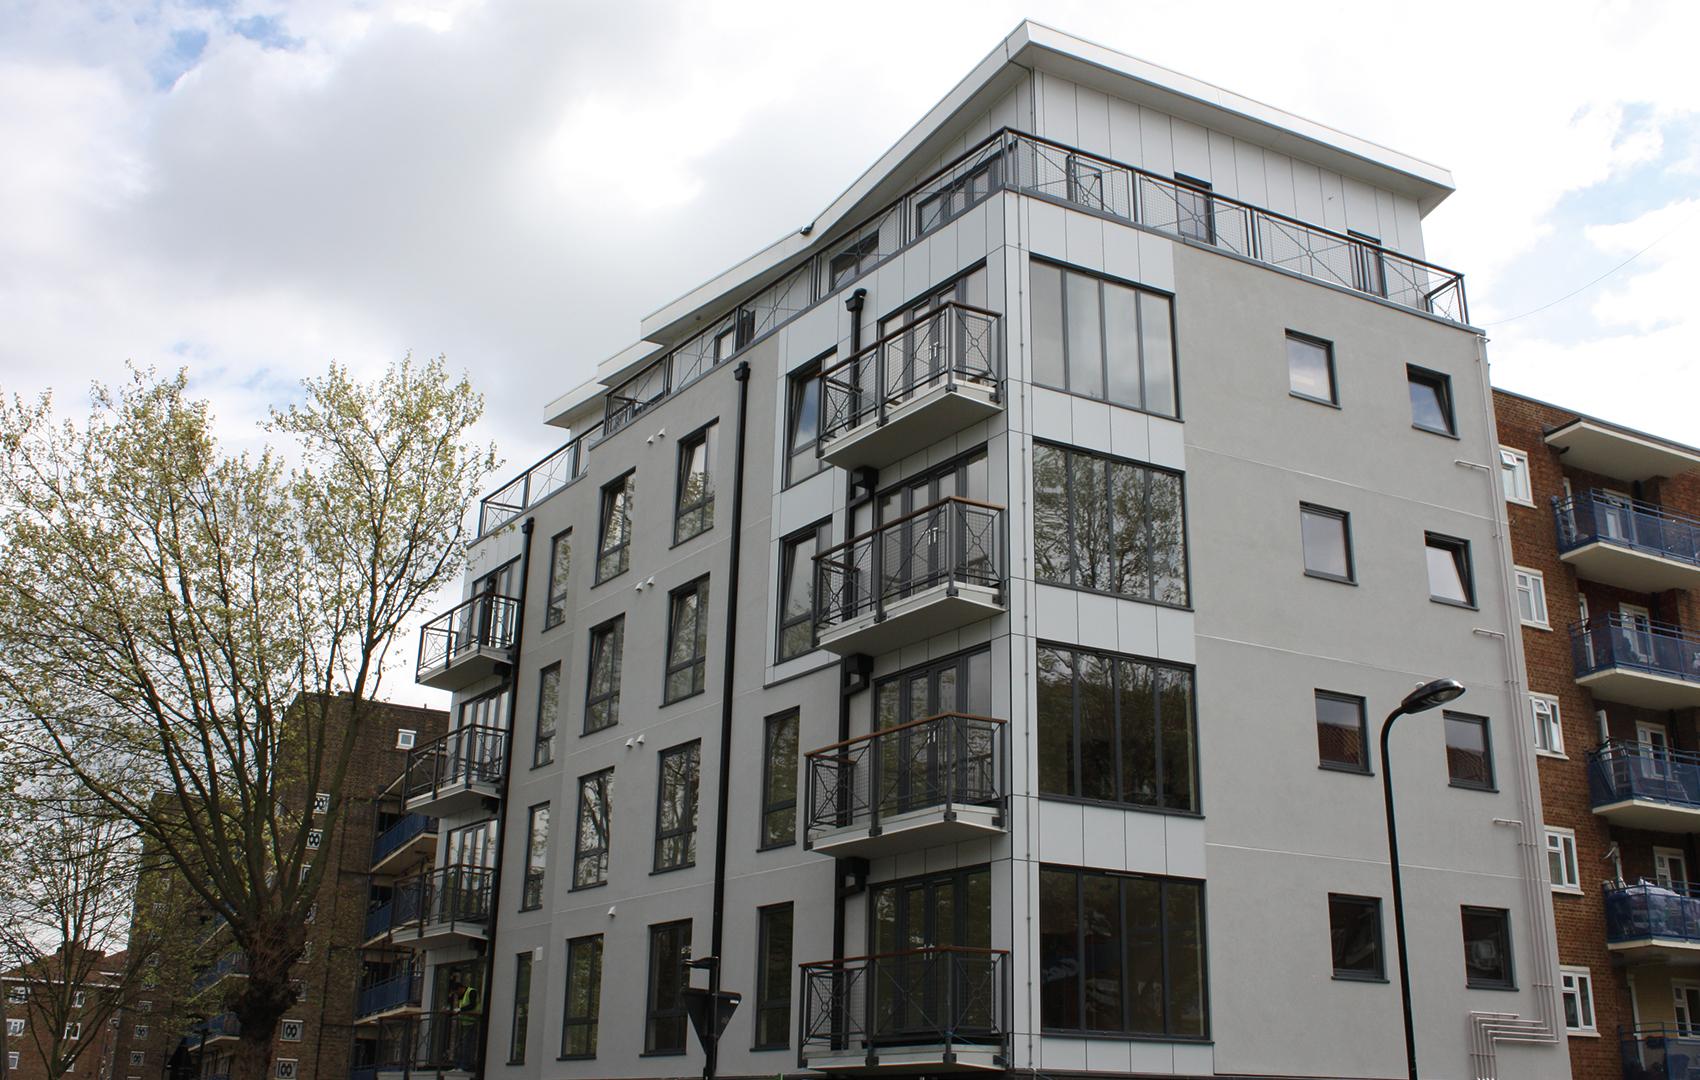 Hackney Housing Apartments